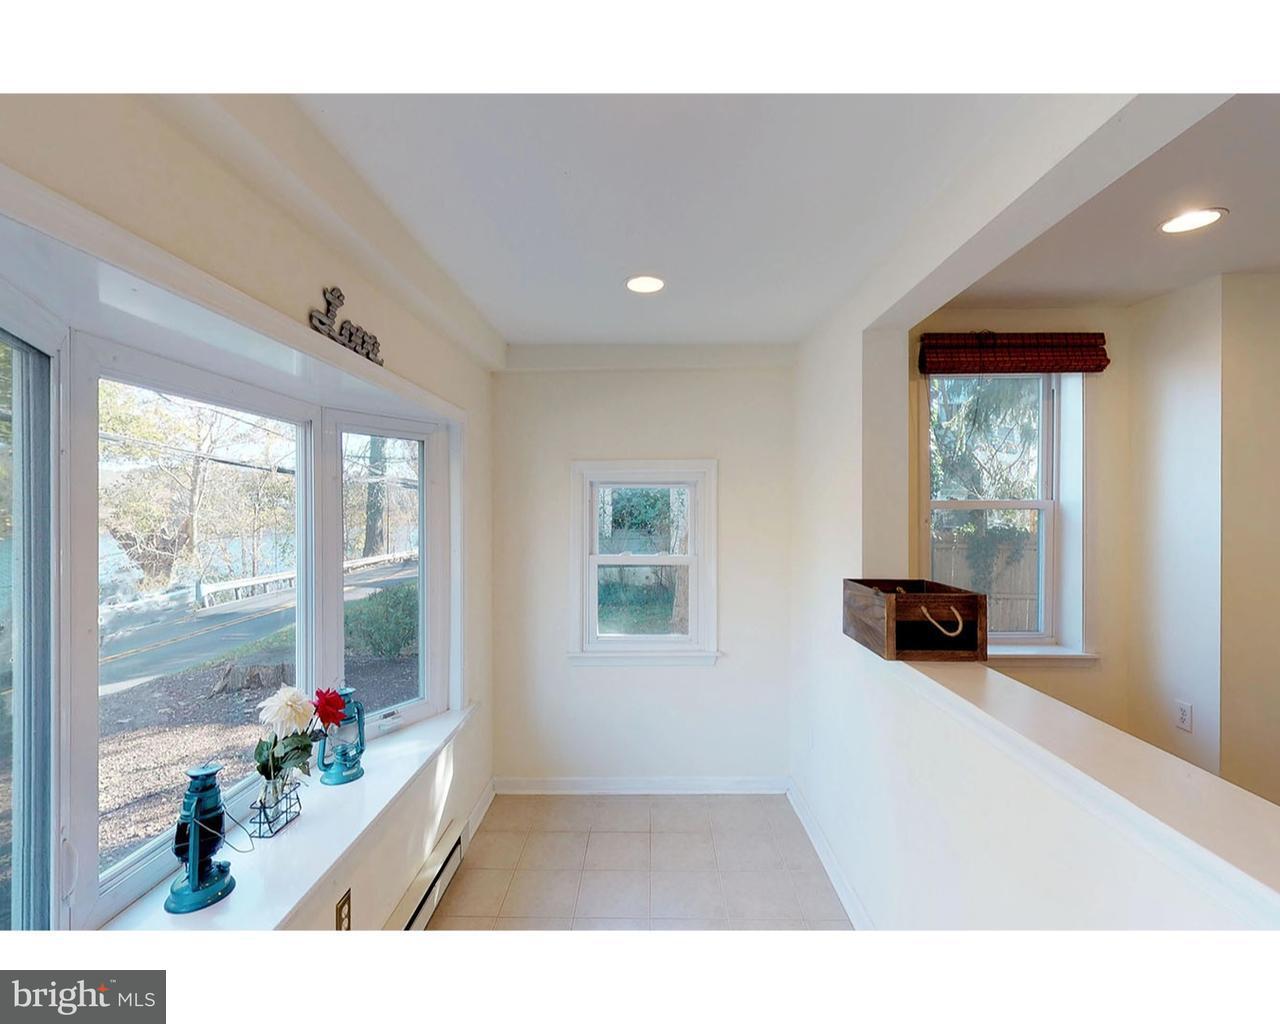 1630 RIVER RD, UPPER BLACK EDDY - Listed at $317,000, UPPER BLACK EDDY